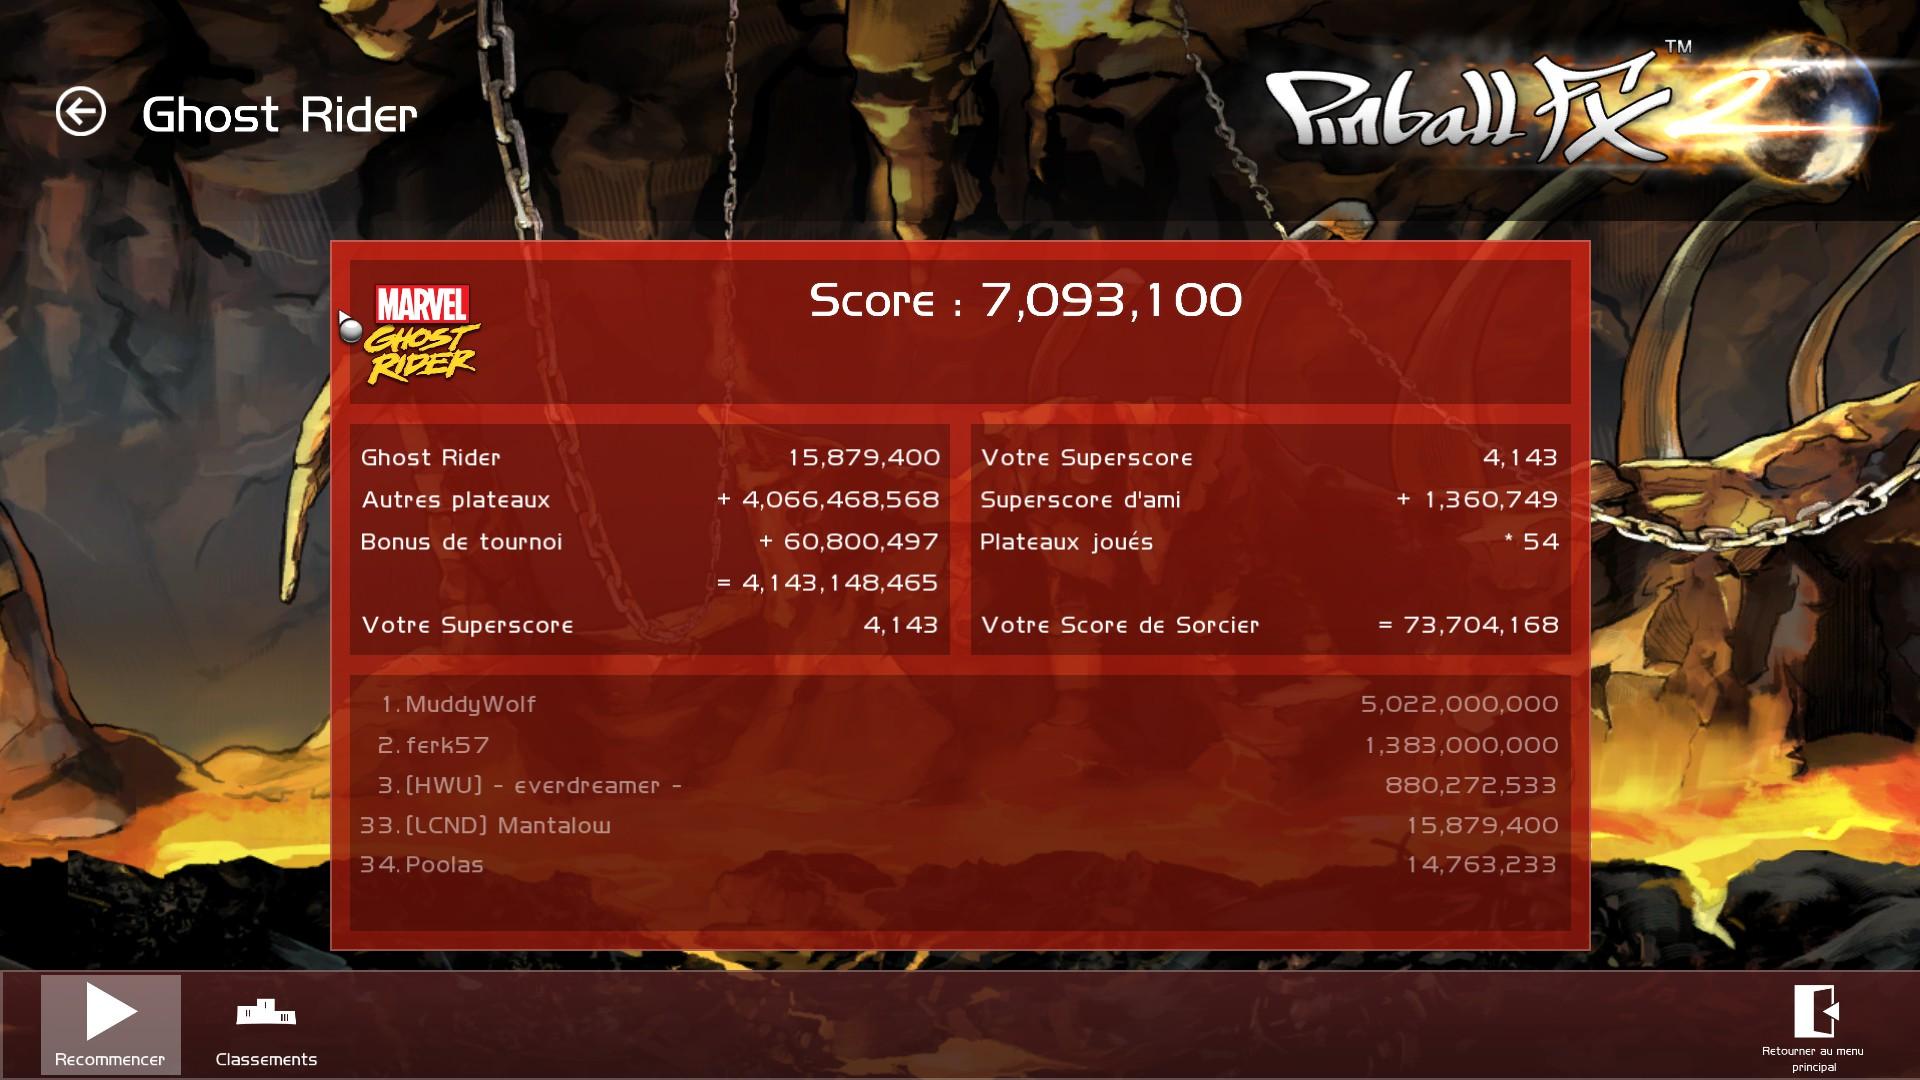 Mantalow: Pinball FX 2: Ghostrider (PC) 15,879,400 points on 2015-07-22 04:42:52